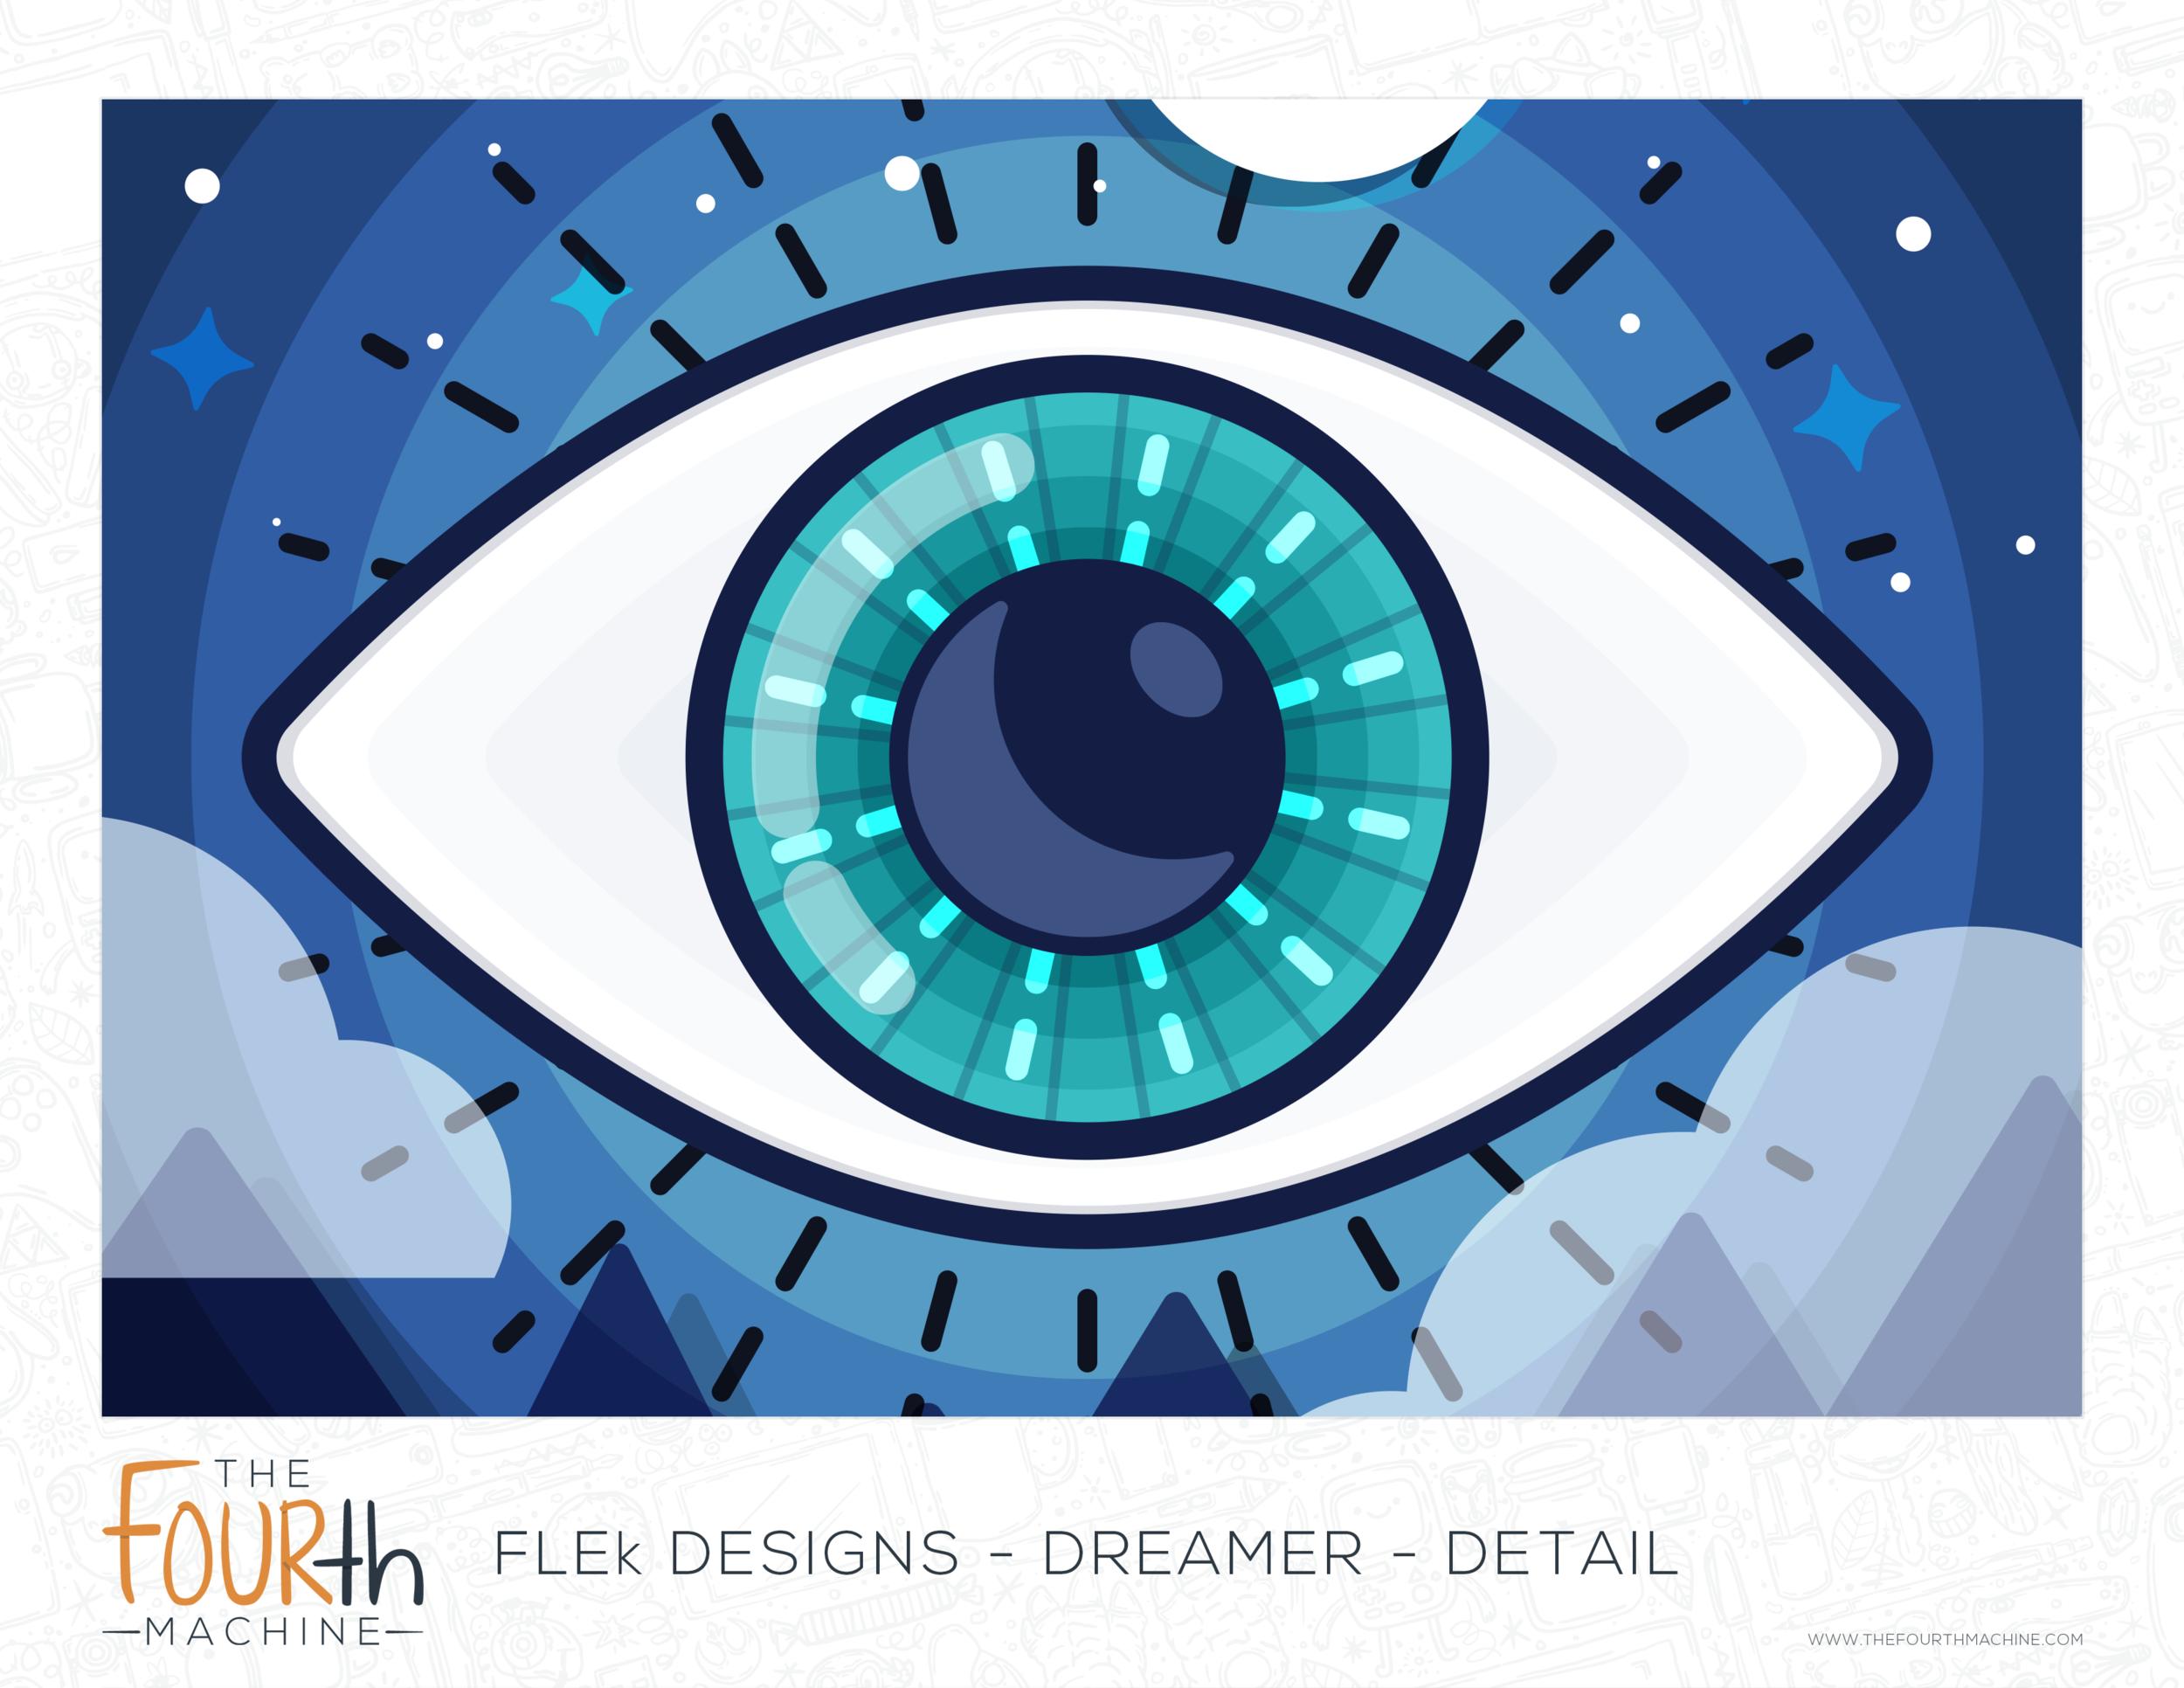 FLEk_Designs_Dreamer.png